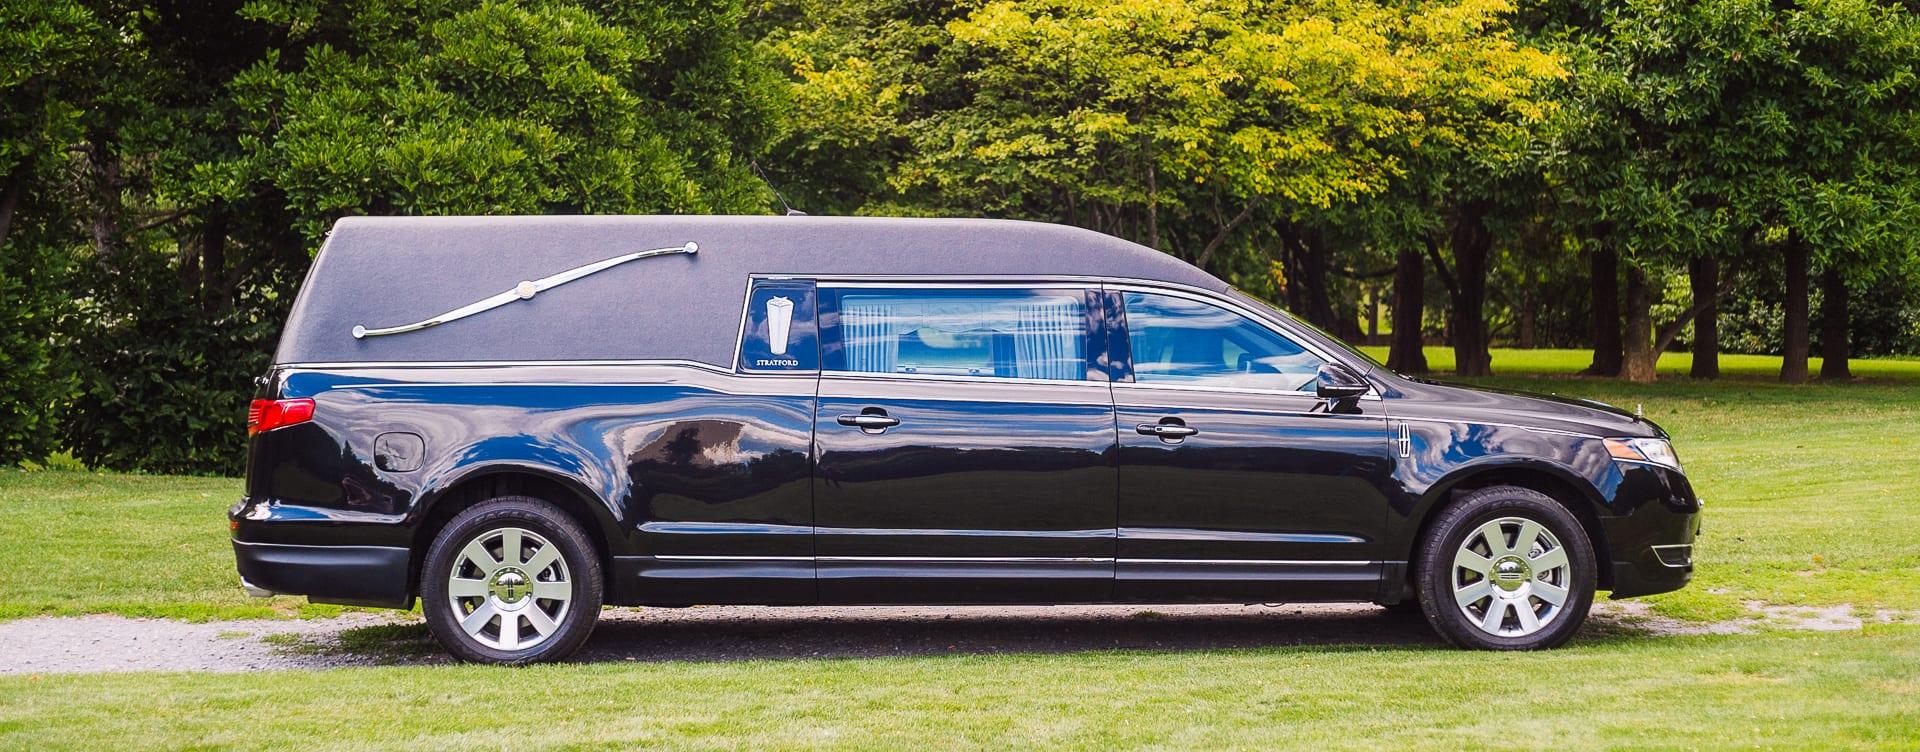 Funeral Limo - Metro Limousine Service